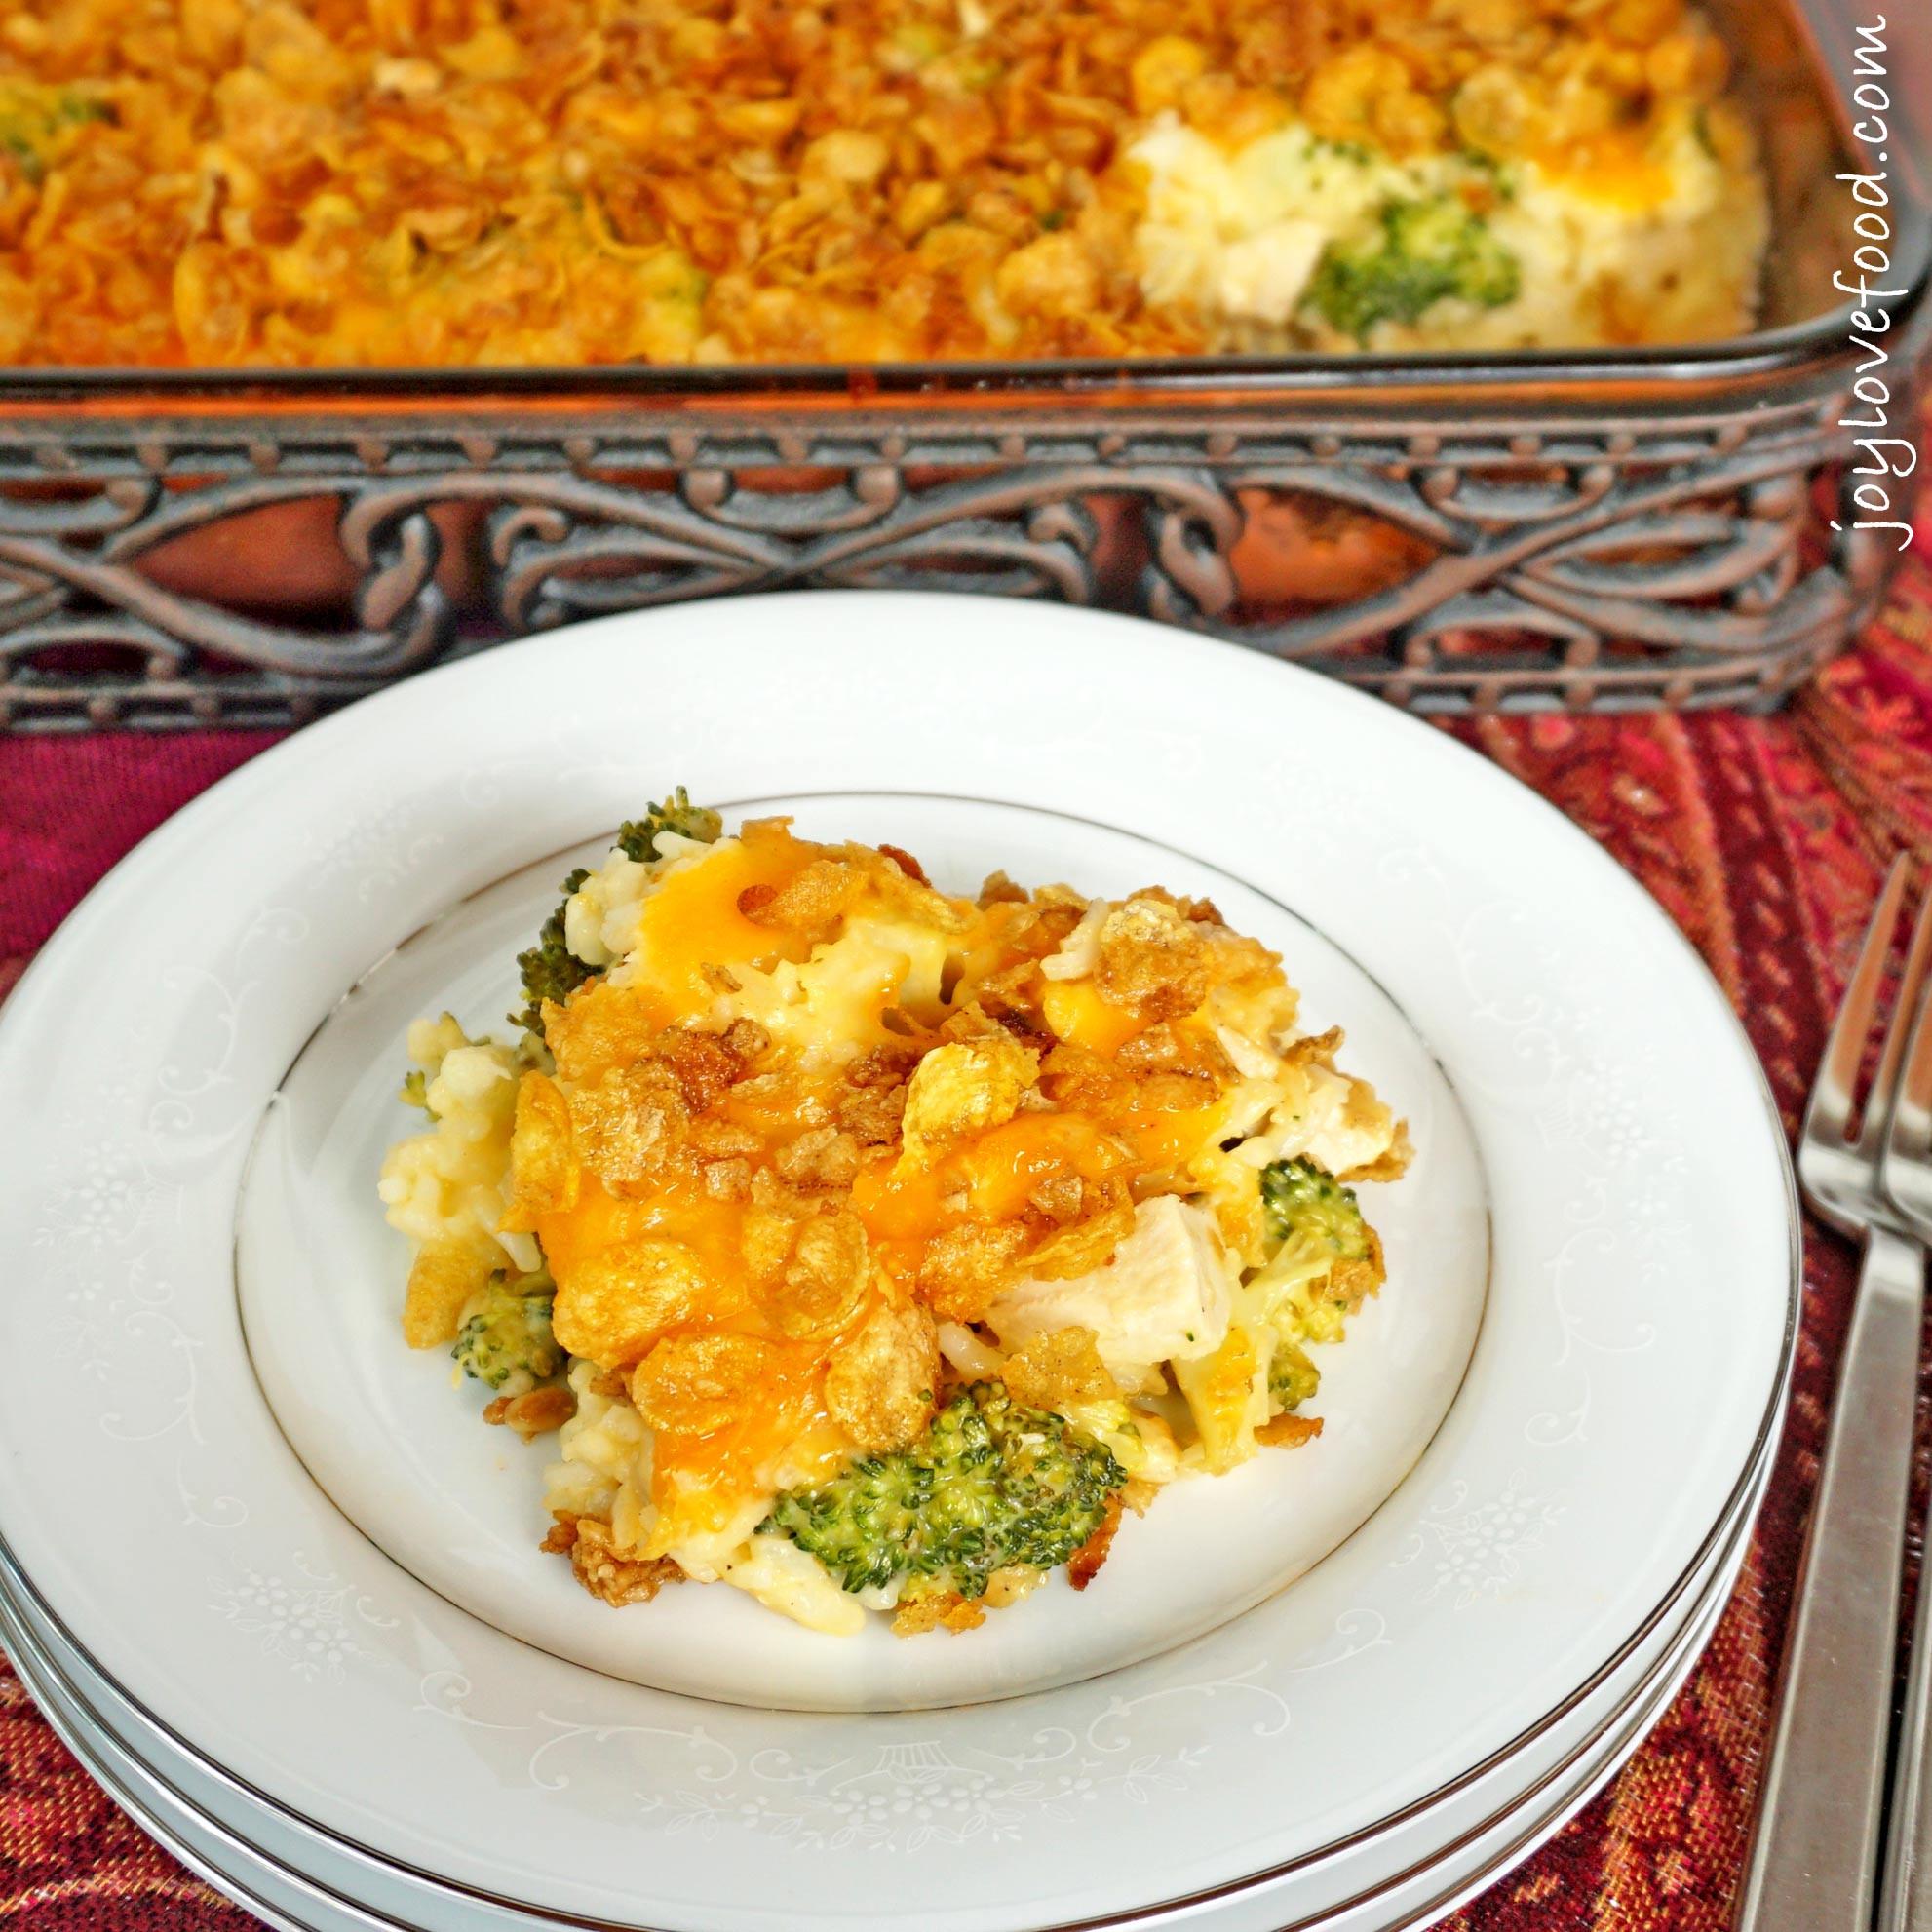 Cheesy Chicken And Rice Casserole  Cheesy Chicken Broccoli and Rice Casserole Joy Love Food